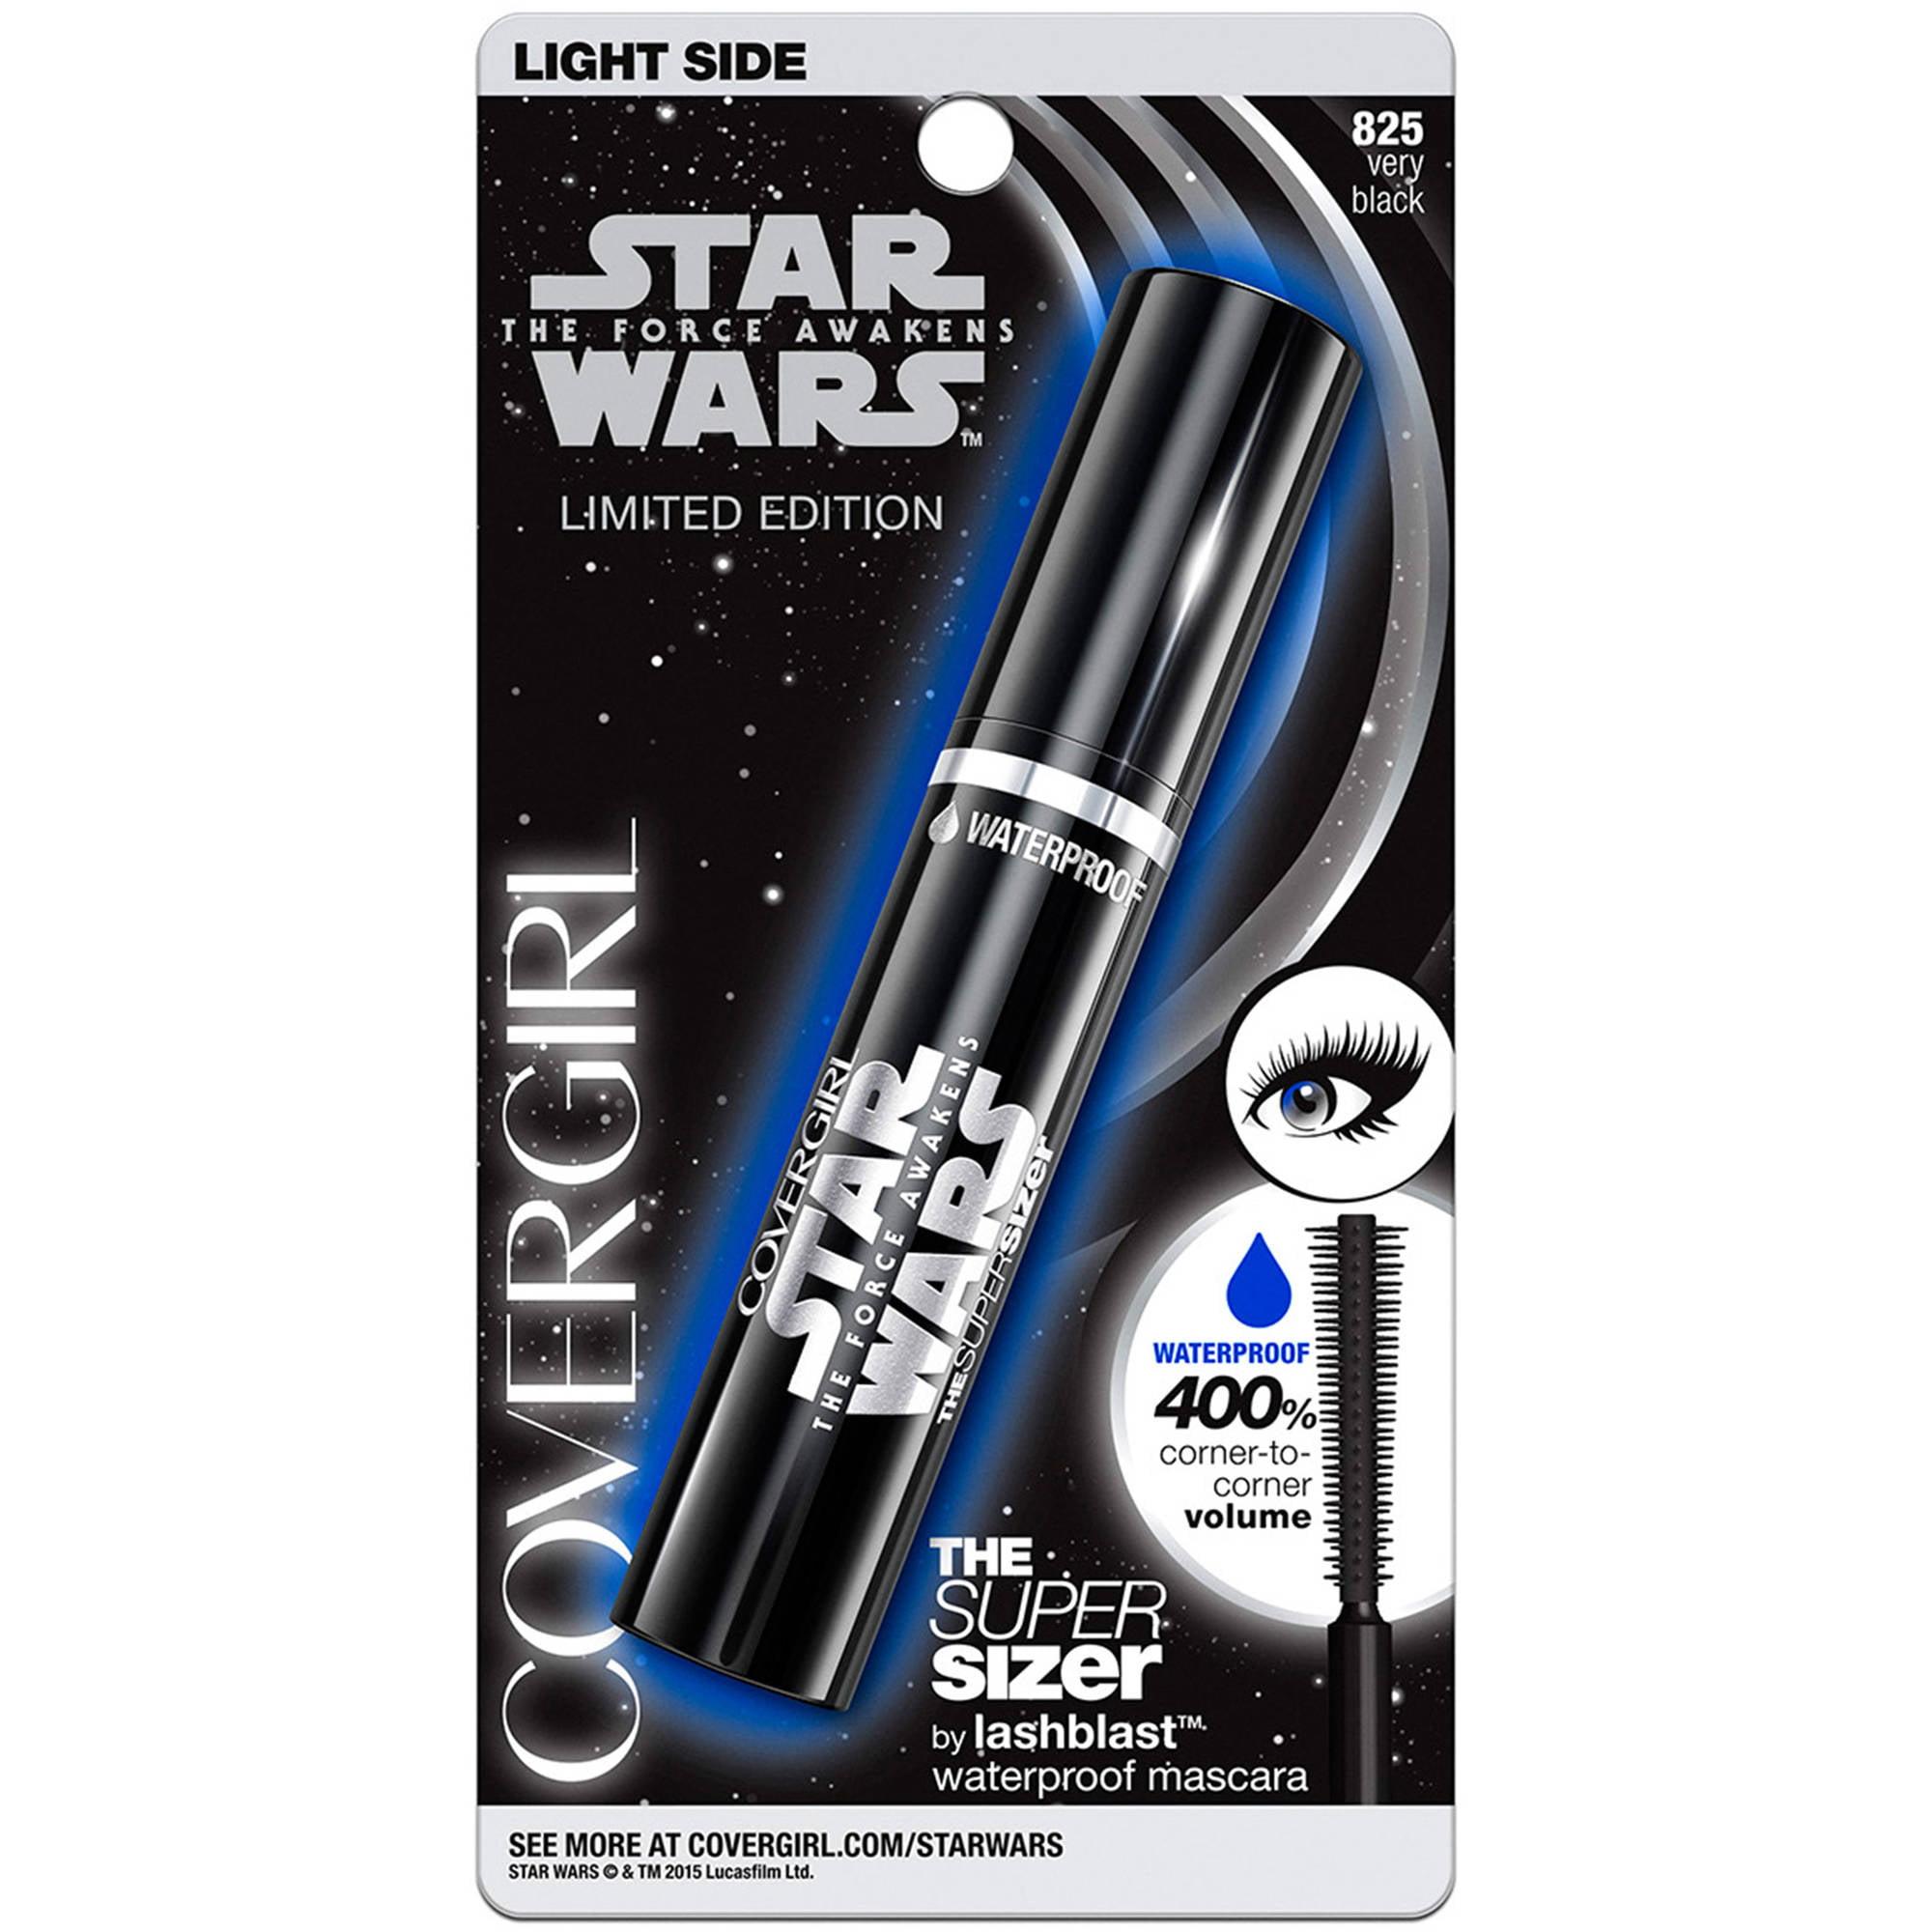 COVERGIRL Star Wars The Super Sizer by lashblast Waterproof Mascara, 825 Very Black, 0.4 fl oz